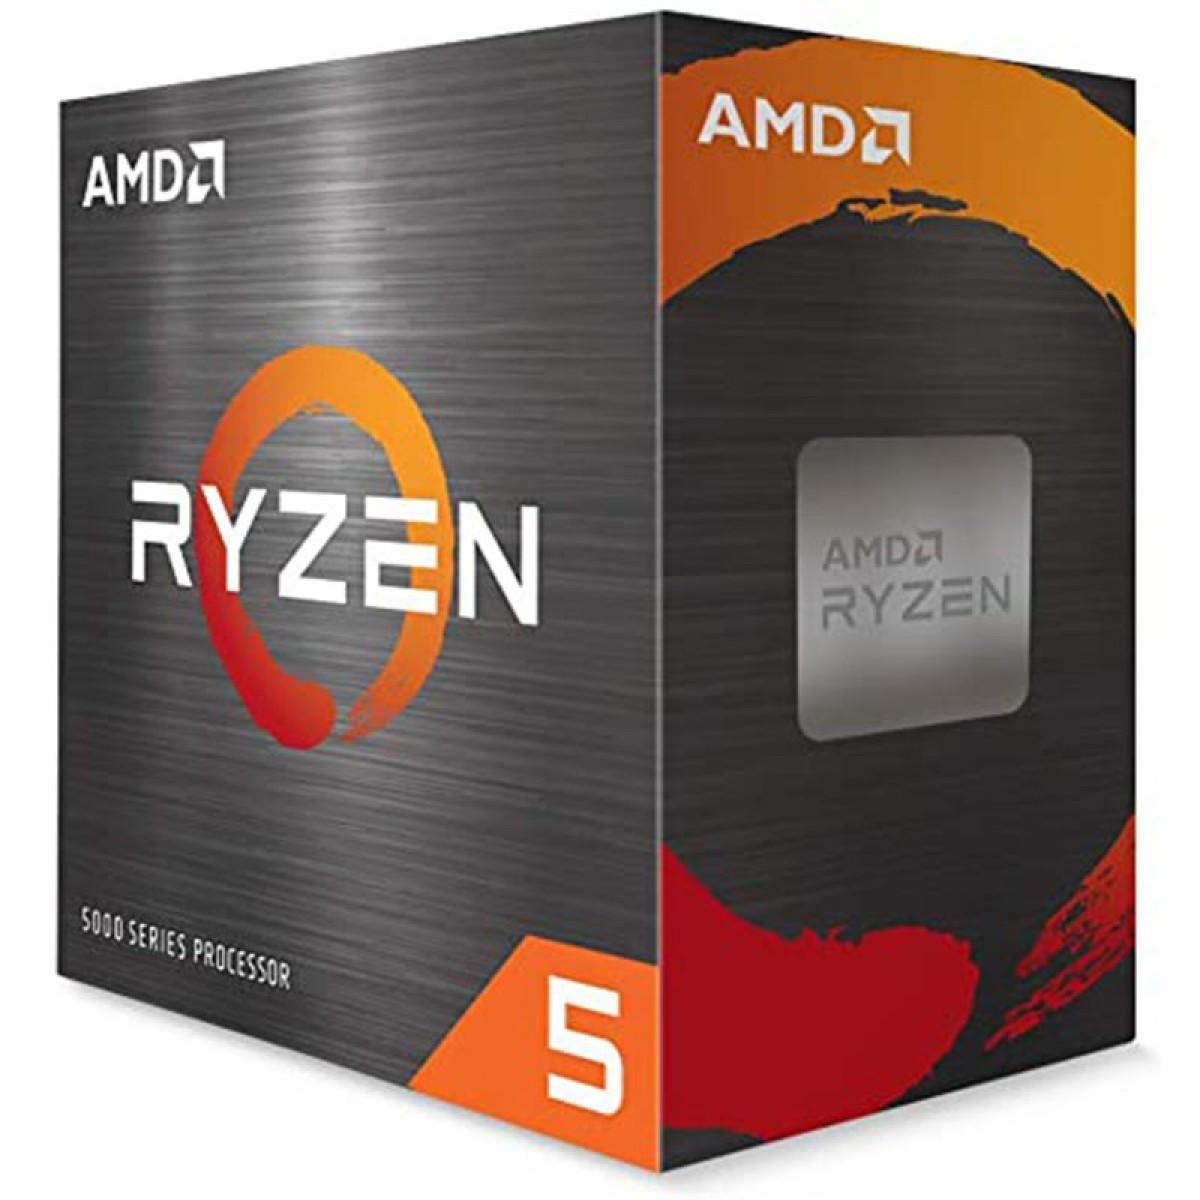 Kit Upgrade, ASUS TUF Gaming X570-Plus + AMD Ryzen 5 5600G + Memória DDR4, 16GB 3000MHz